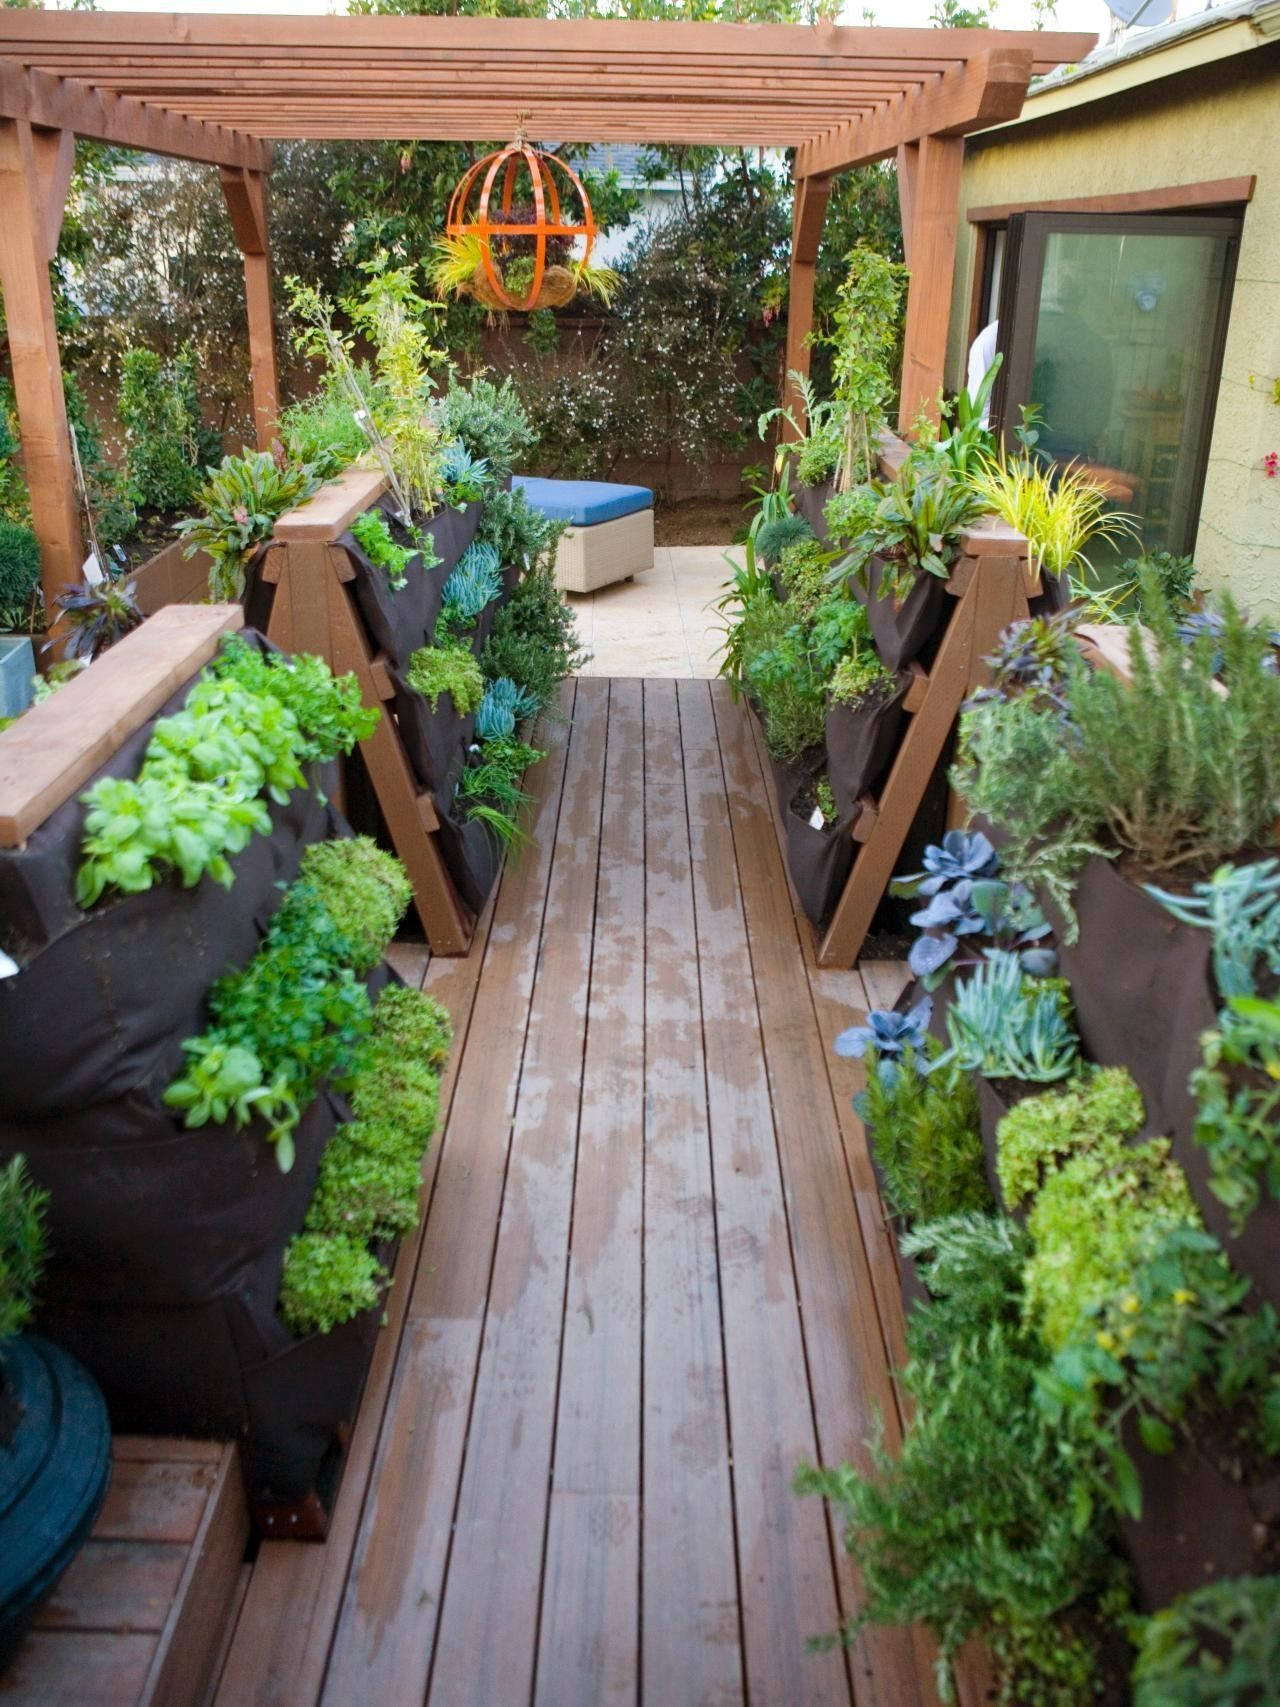 Awe Inspiring Container Garden Ideas On Deck Garden Containers